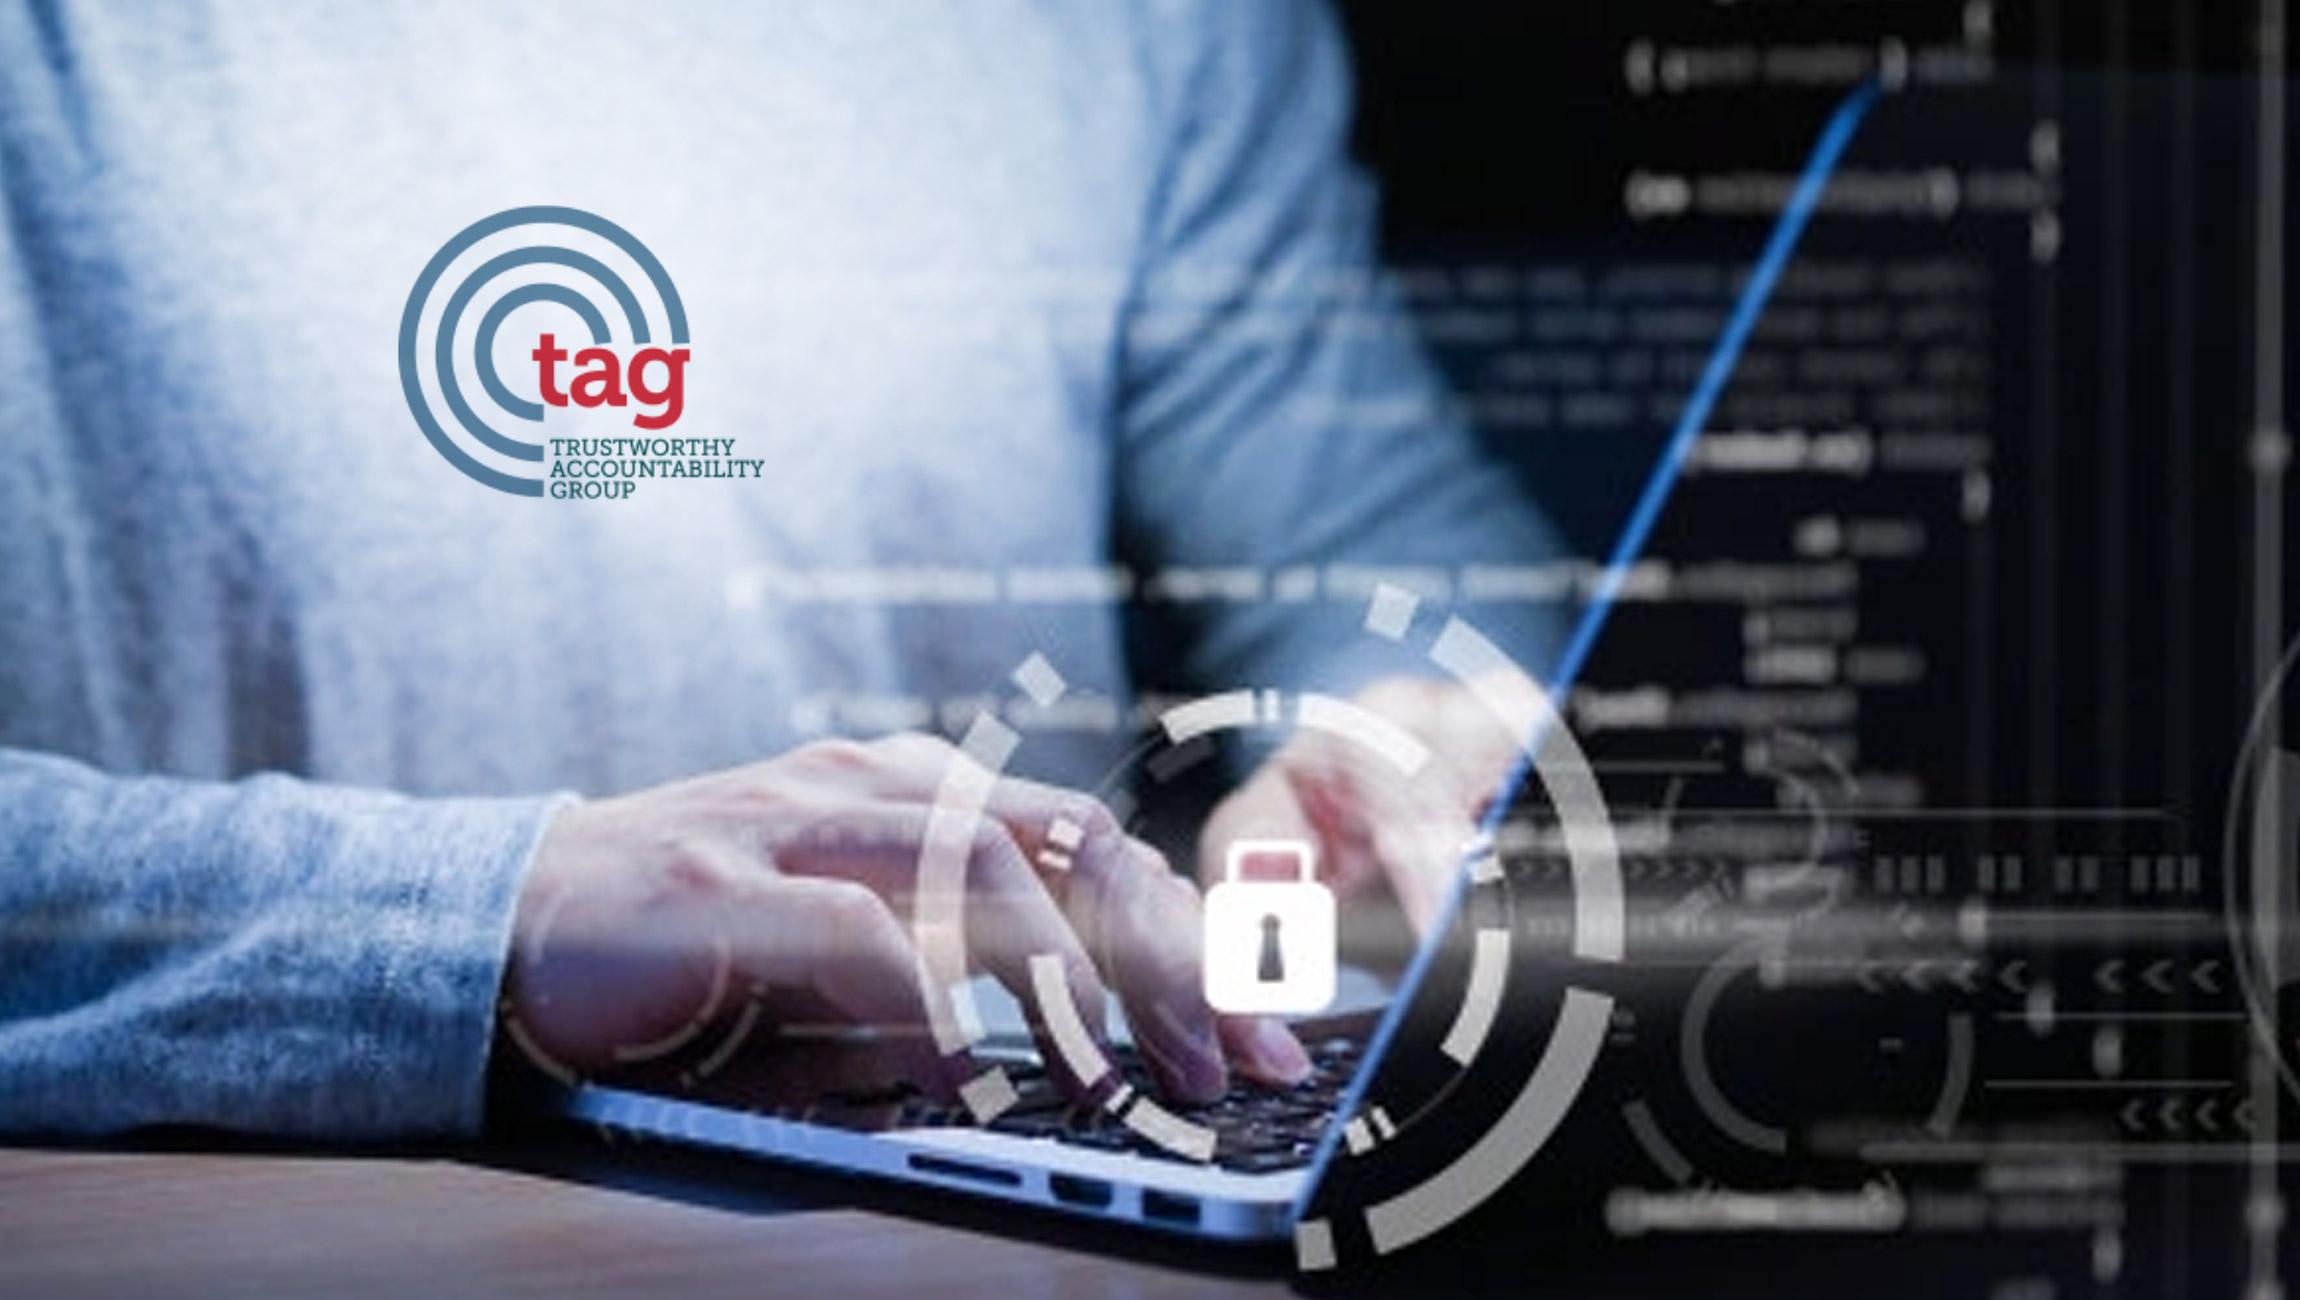 European Study Shows Minimal Ad Fraud When Multiple Supply Chain Participants Adopt Rigorous Standards